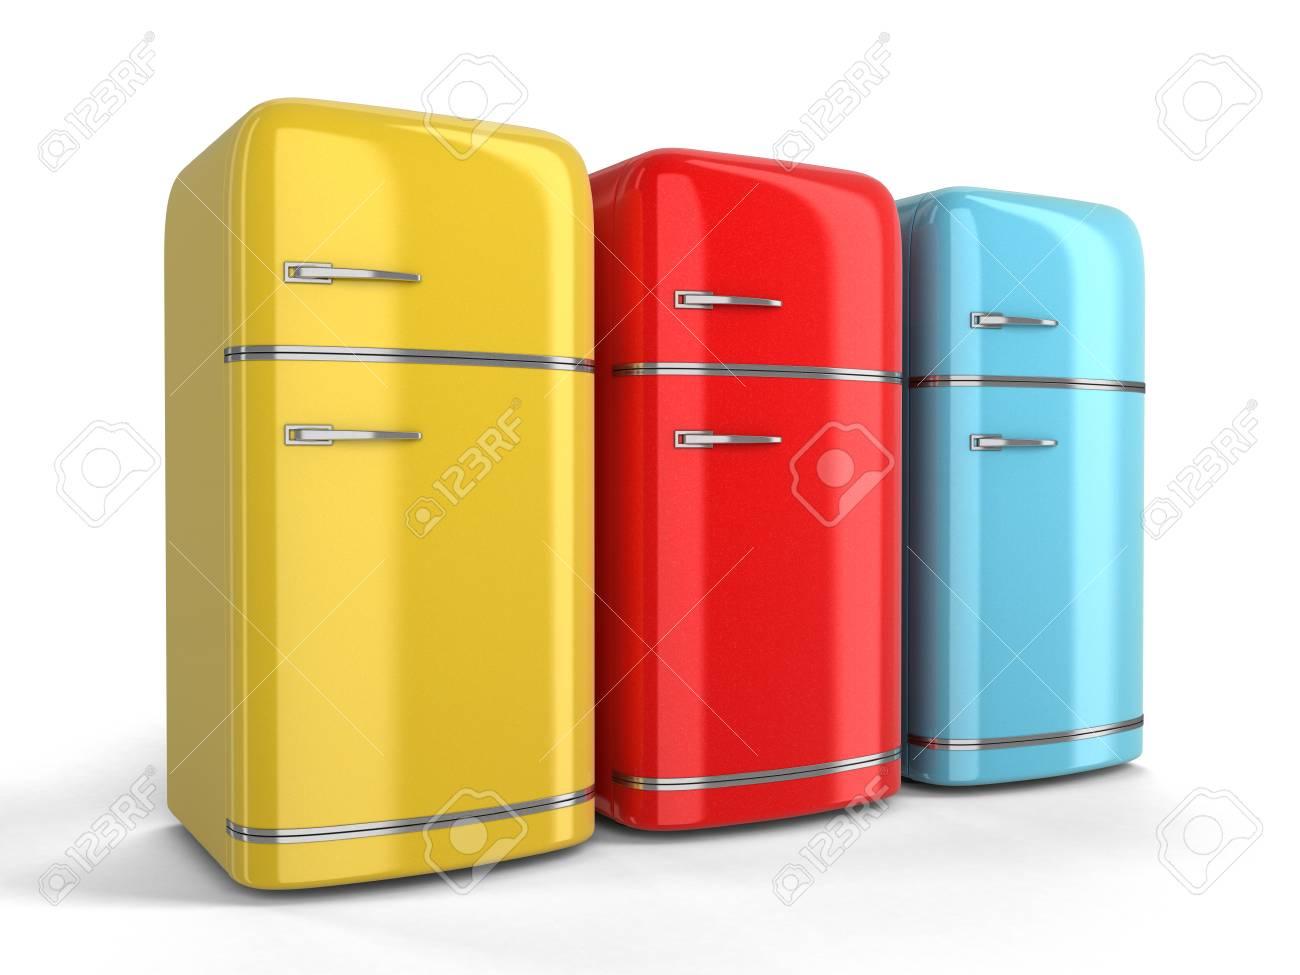 Retro Kühlschrank Real : Finebuy mini kühlschrank liter ab u ac preisvergleich bei